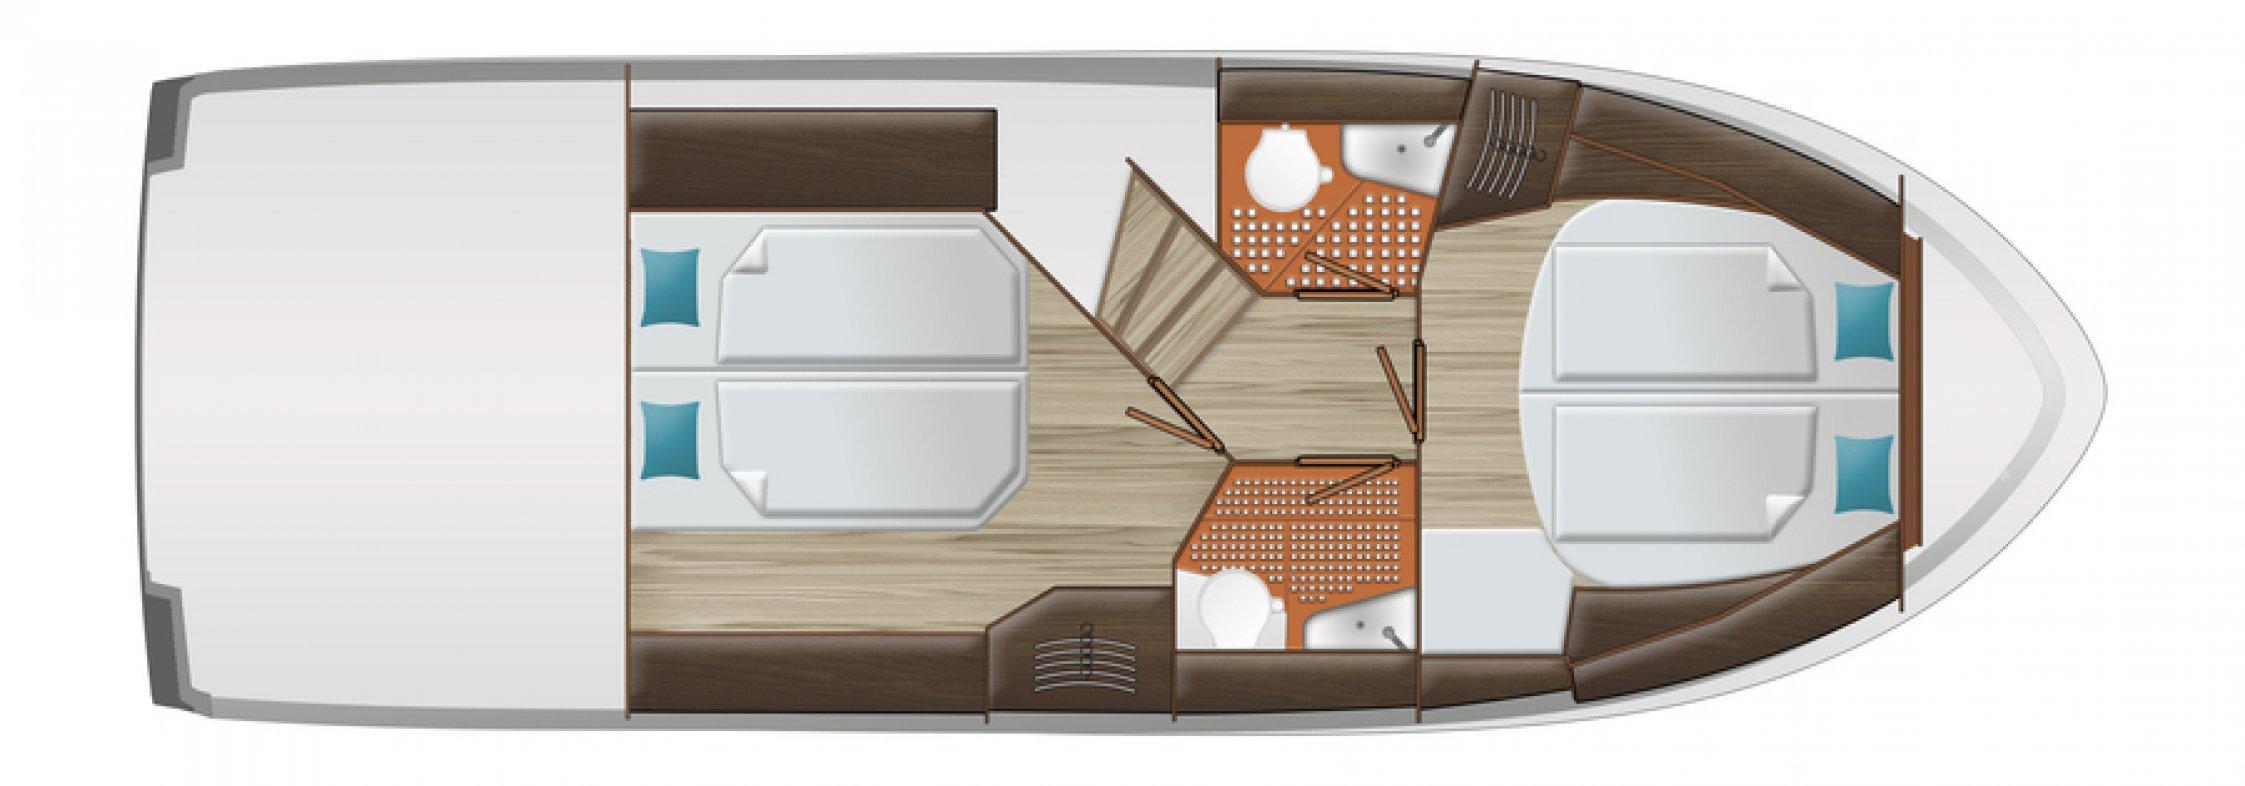 Delphia Escape 1150 Voyage